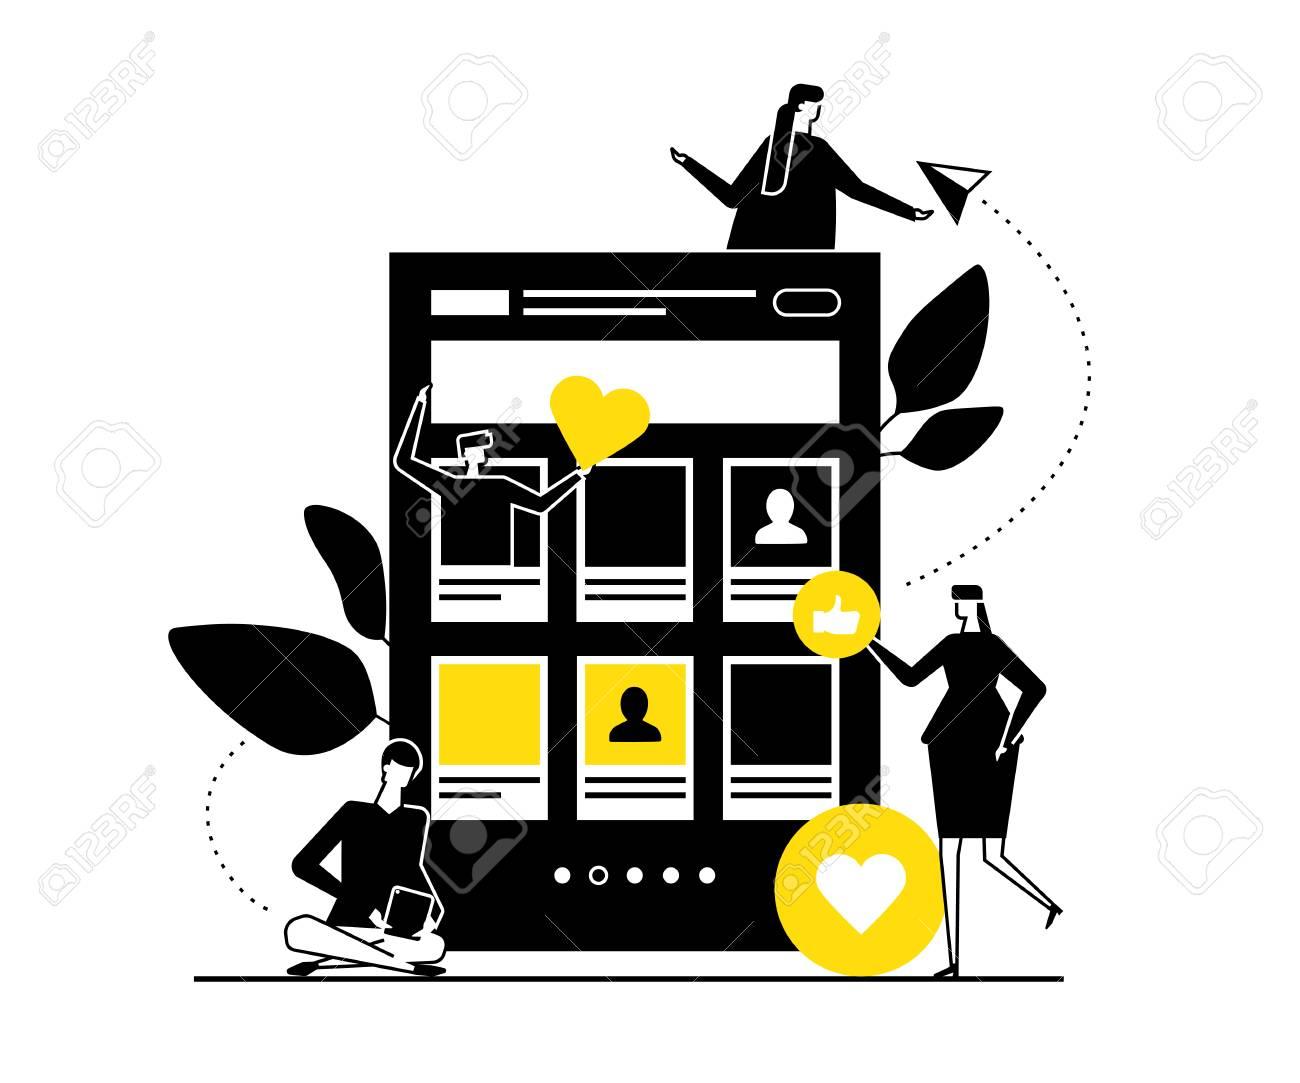 Dating app - flat design style vector illustration  Black, yellow